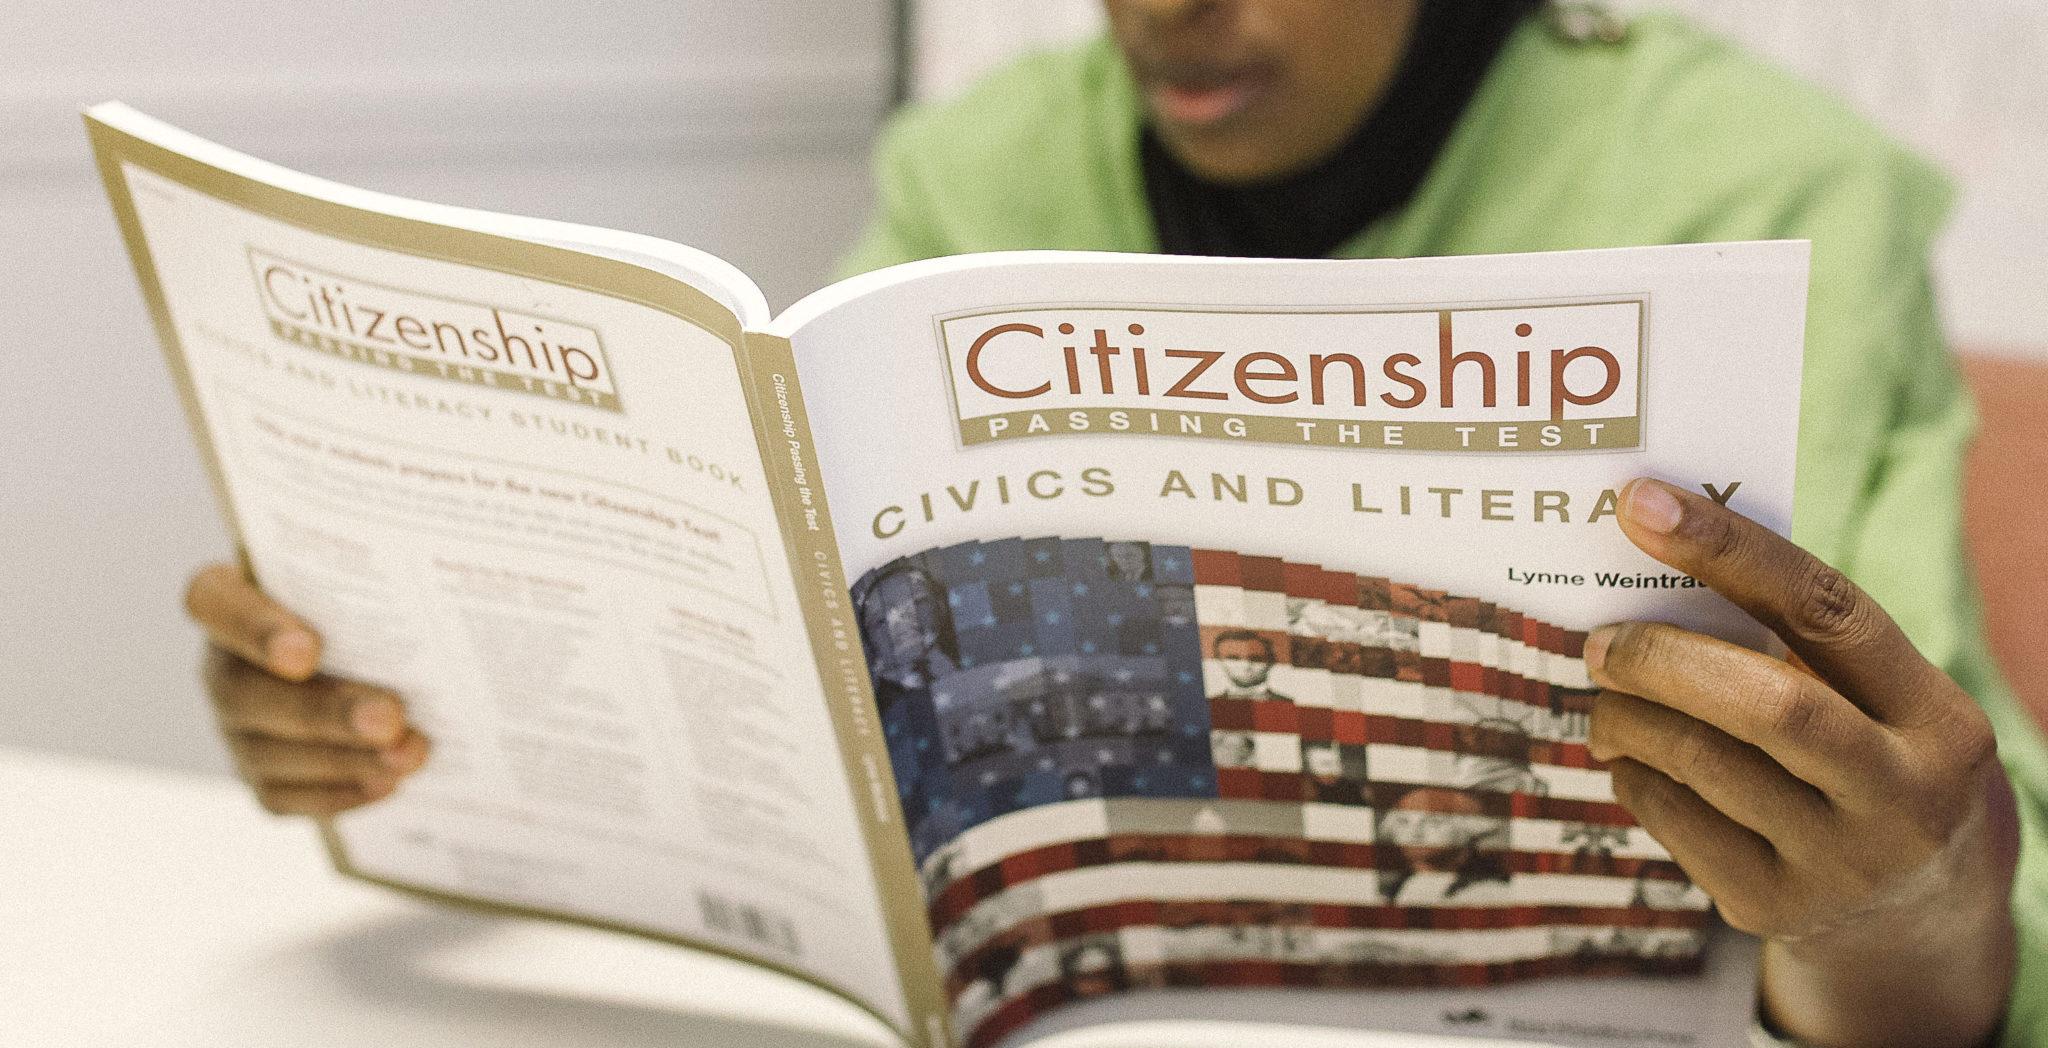 ESOL, CONVERSATION & CITIZENSHIP - Literacy Action, Inc